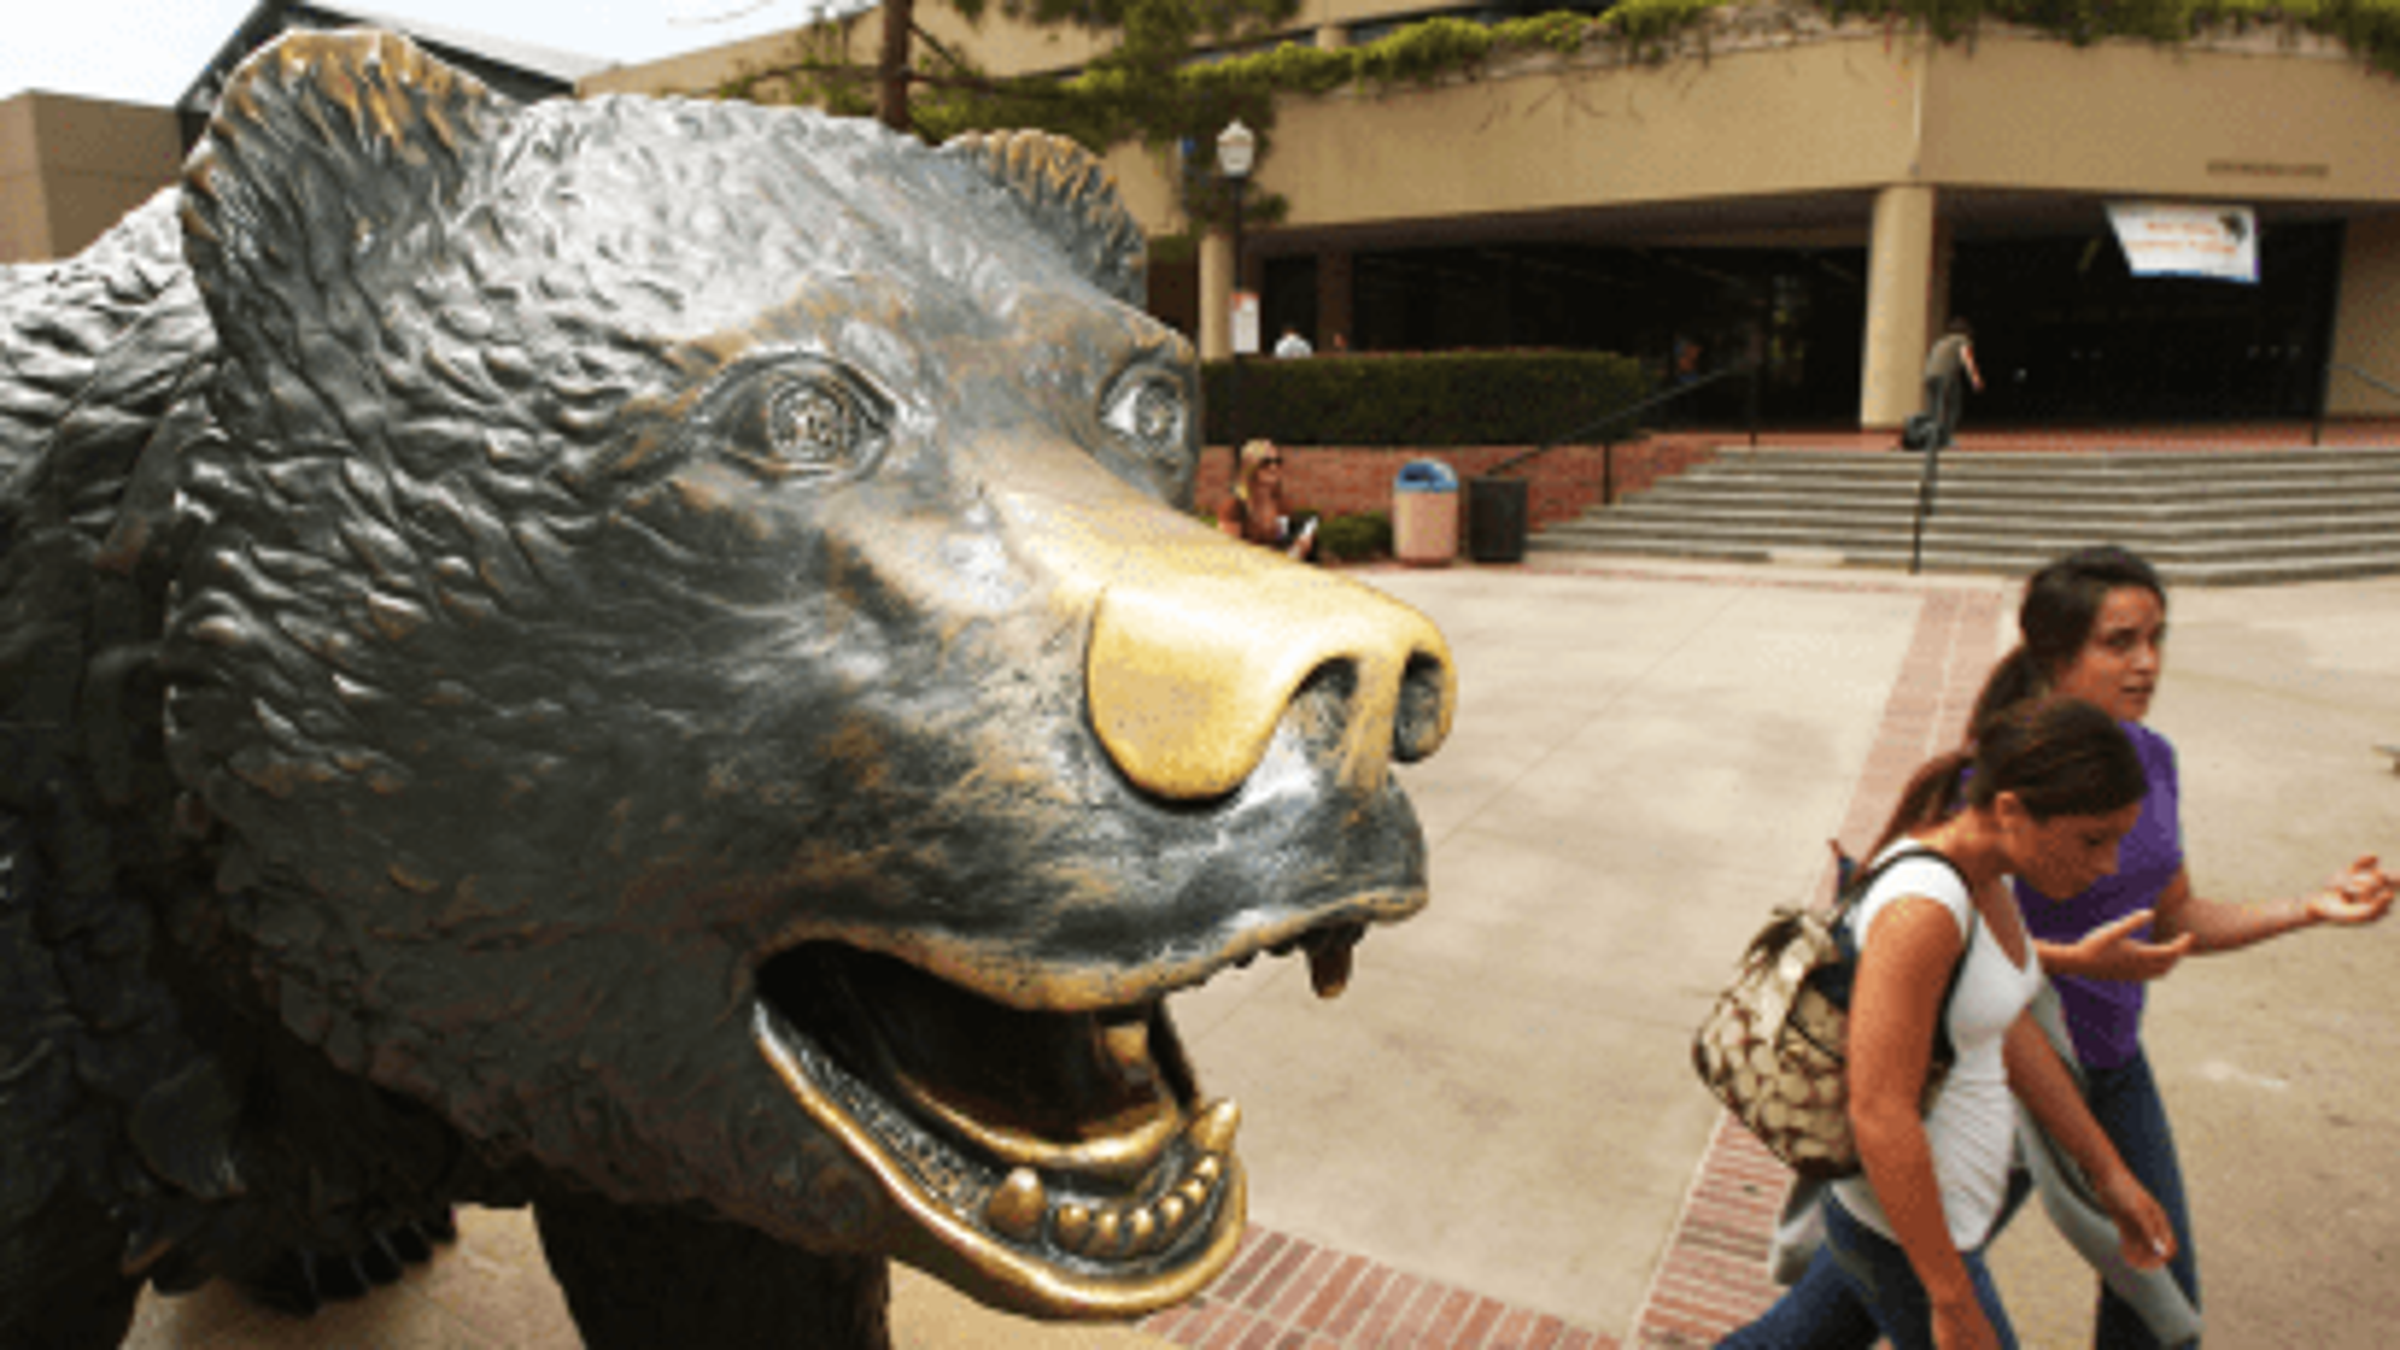 Education: a bear necessity